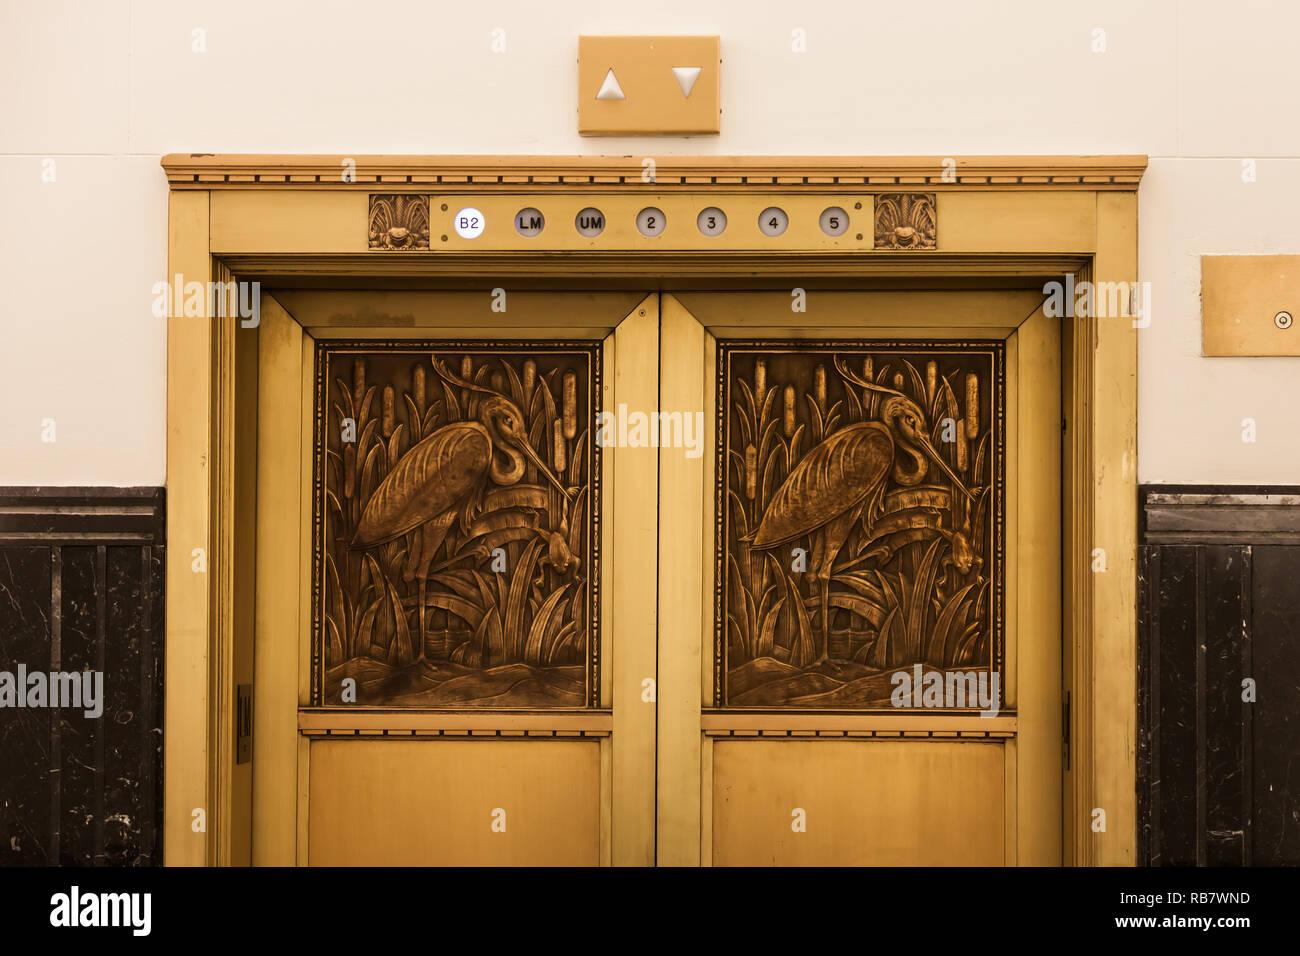 Brass elevator doors in a heritage building - Stock Image